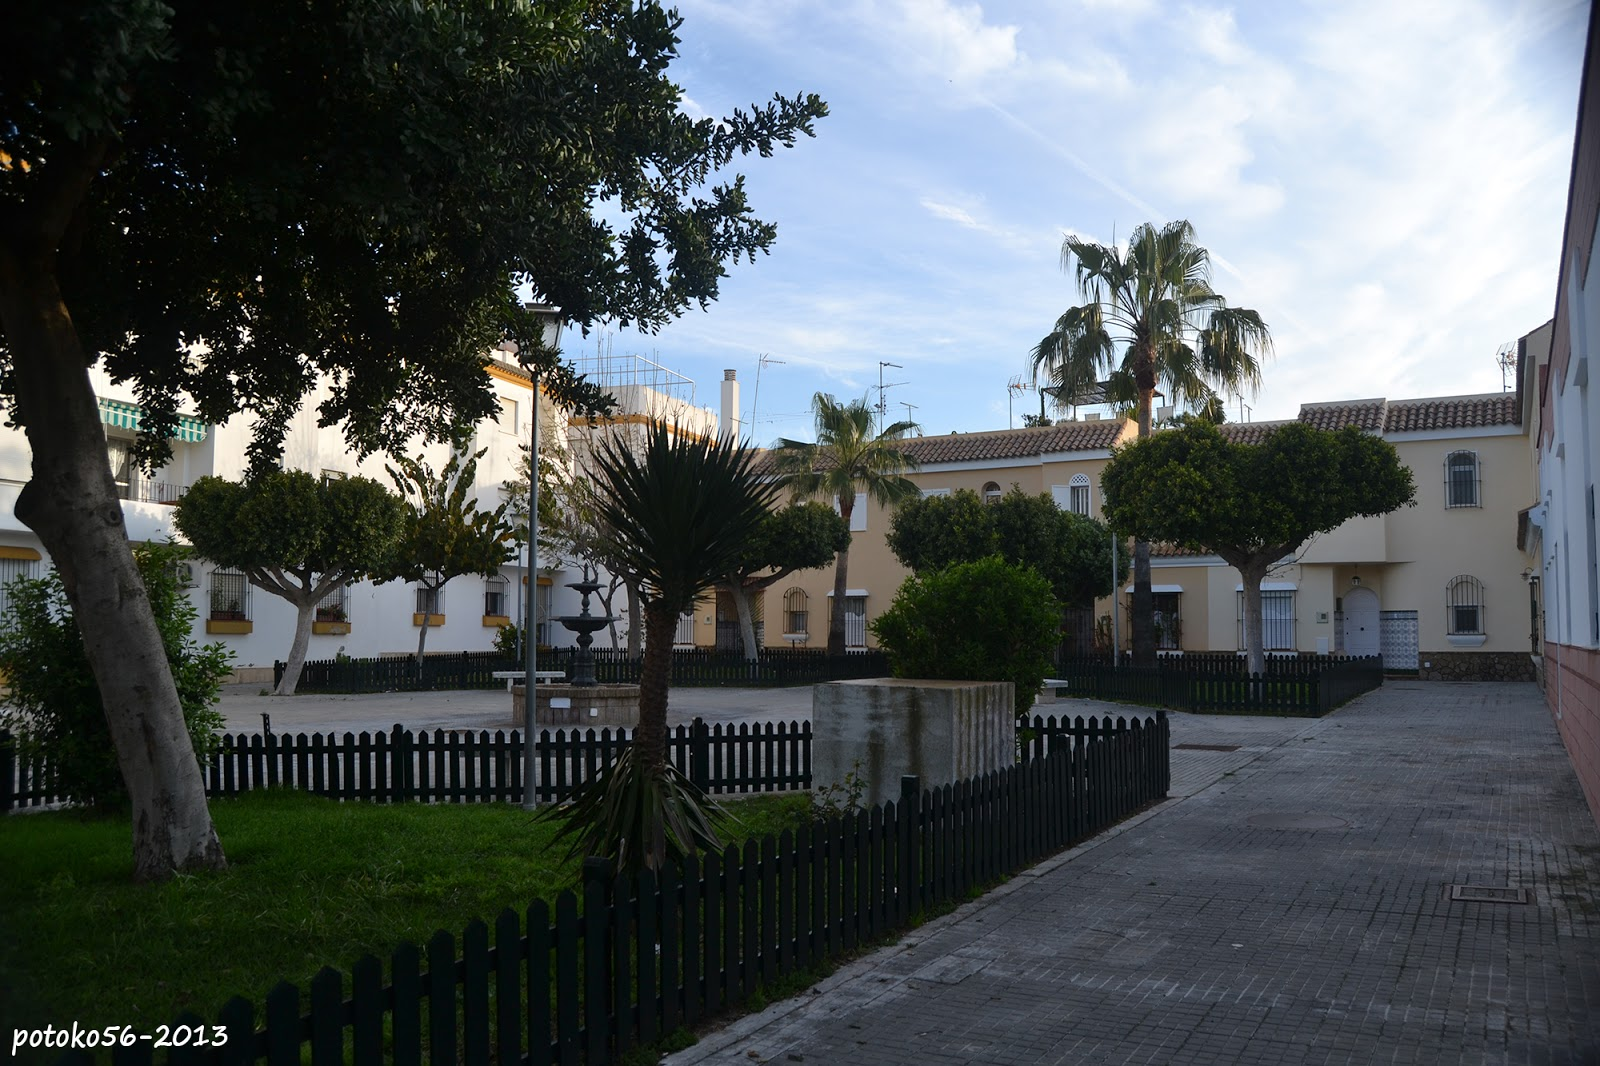 Plaza José María Pemán Rota